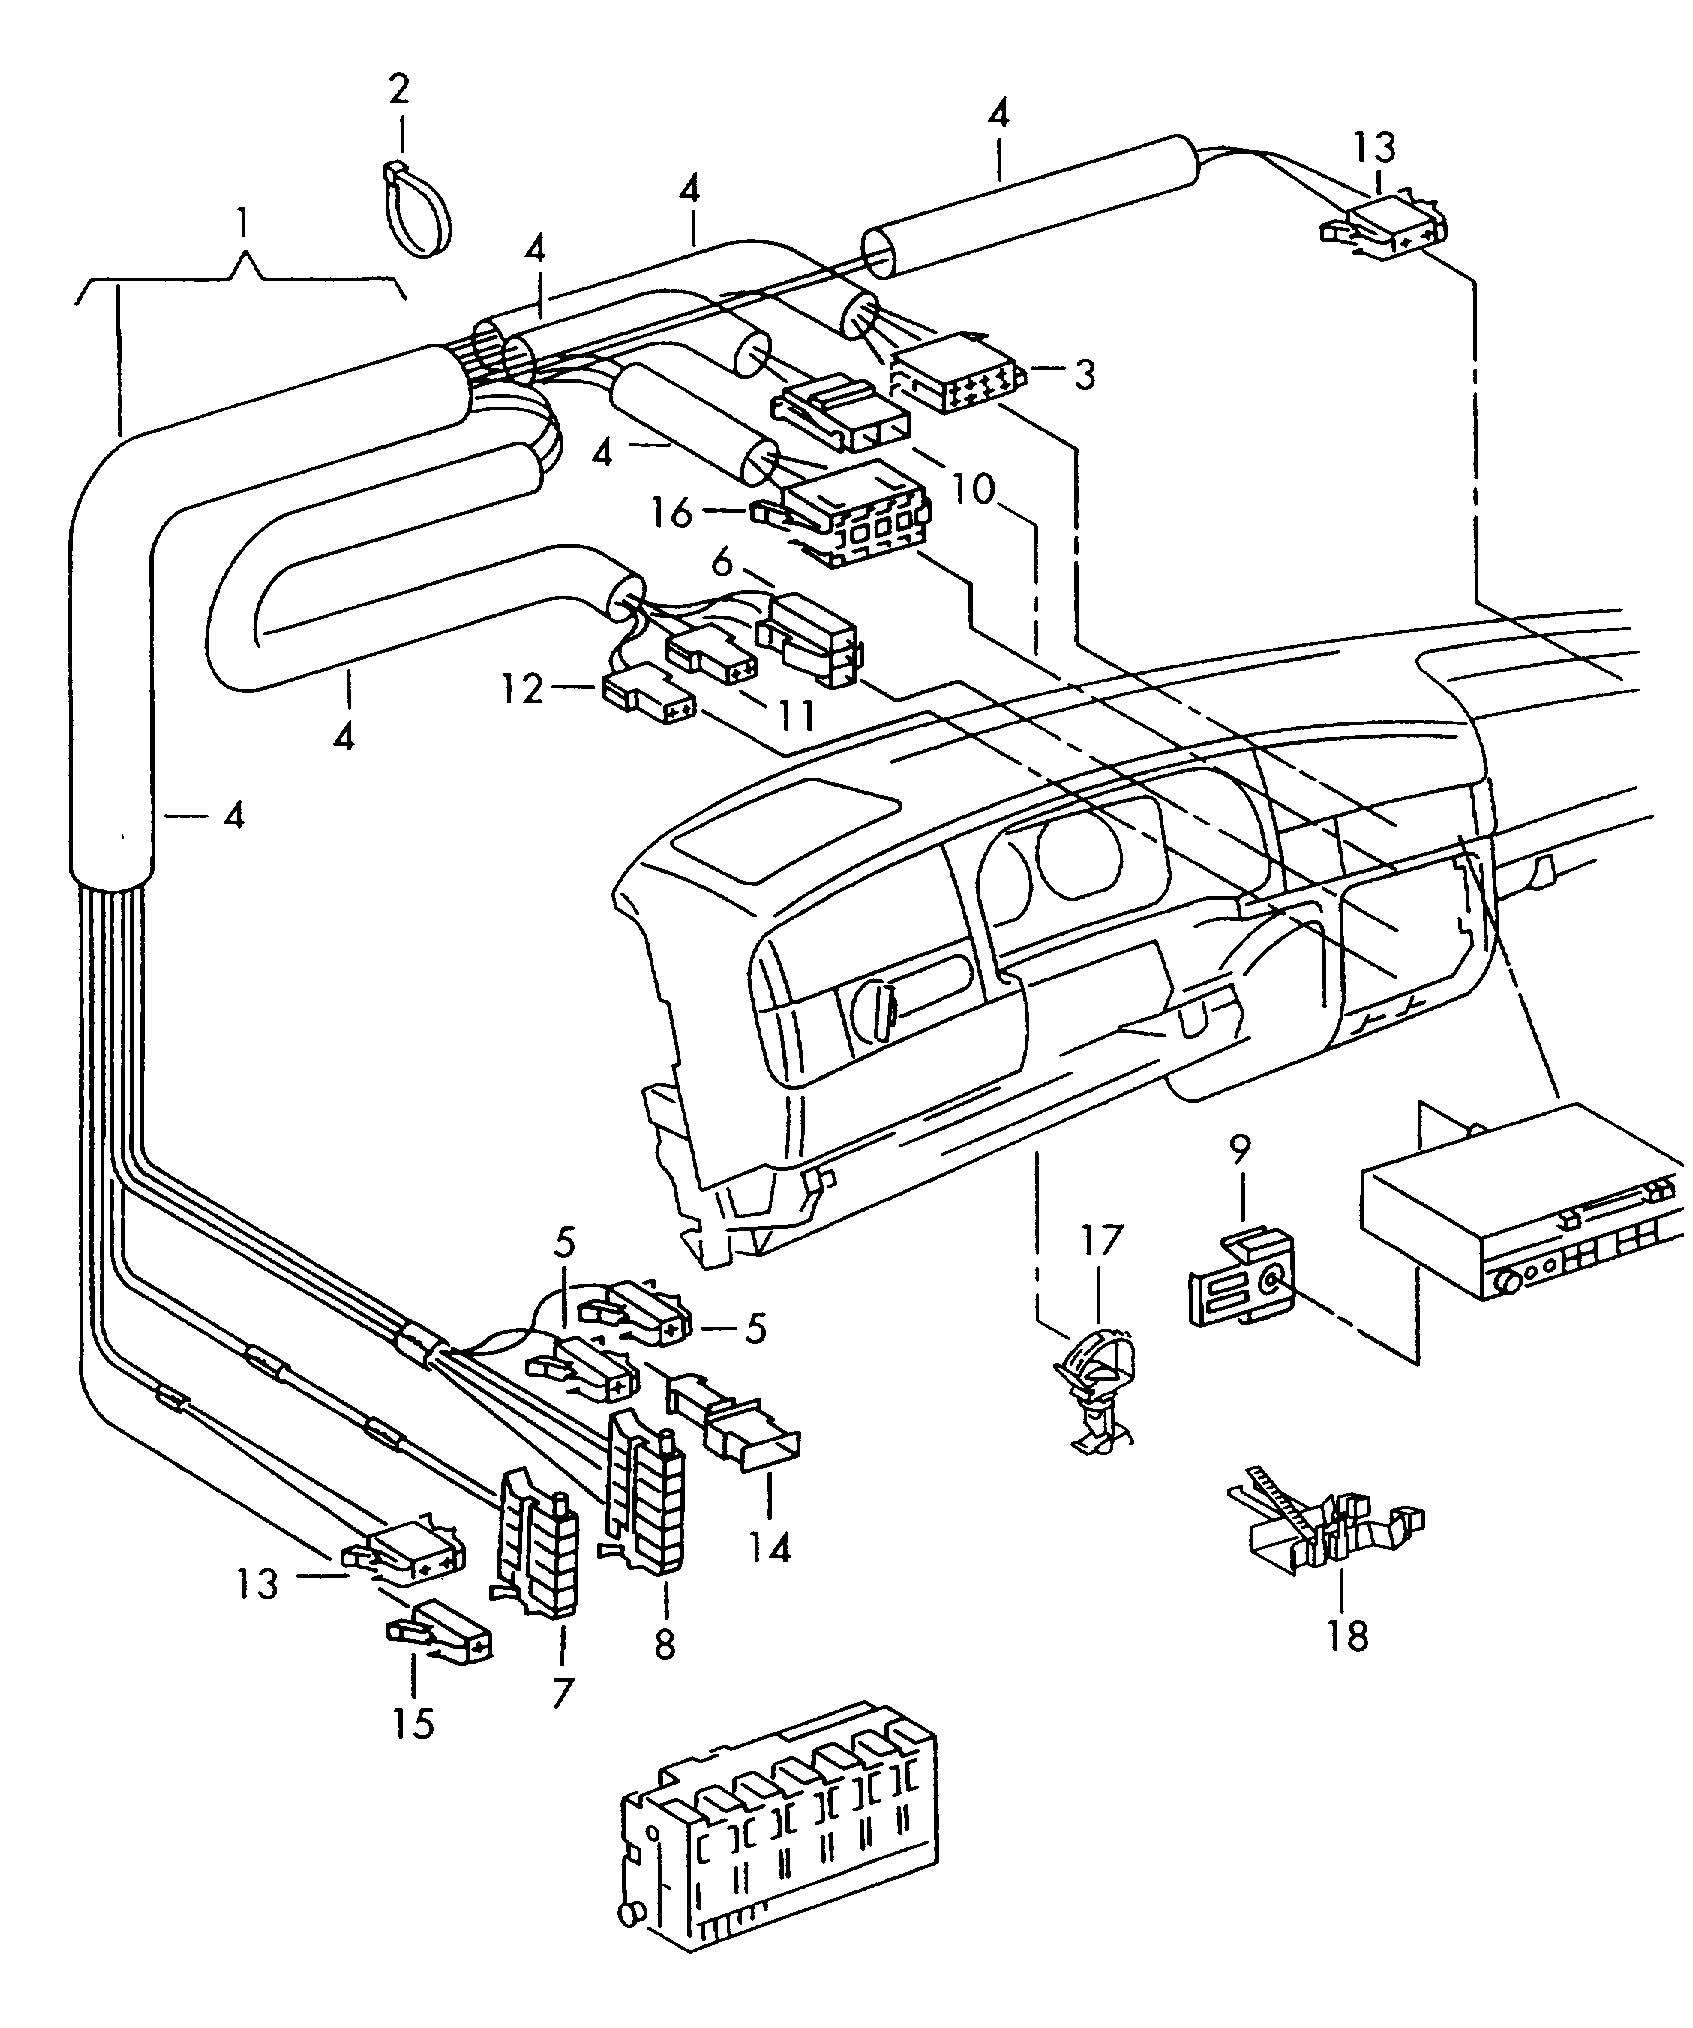 1970 vw bug fuse box